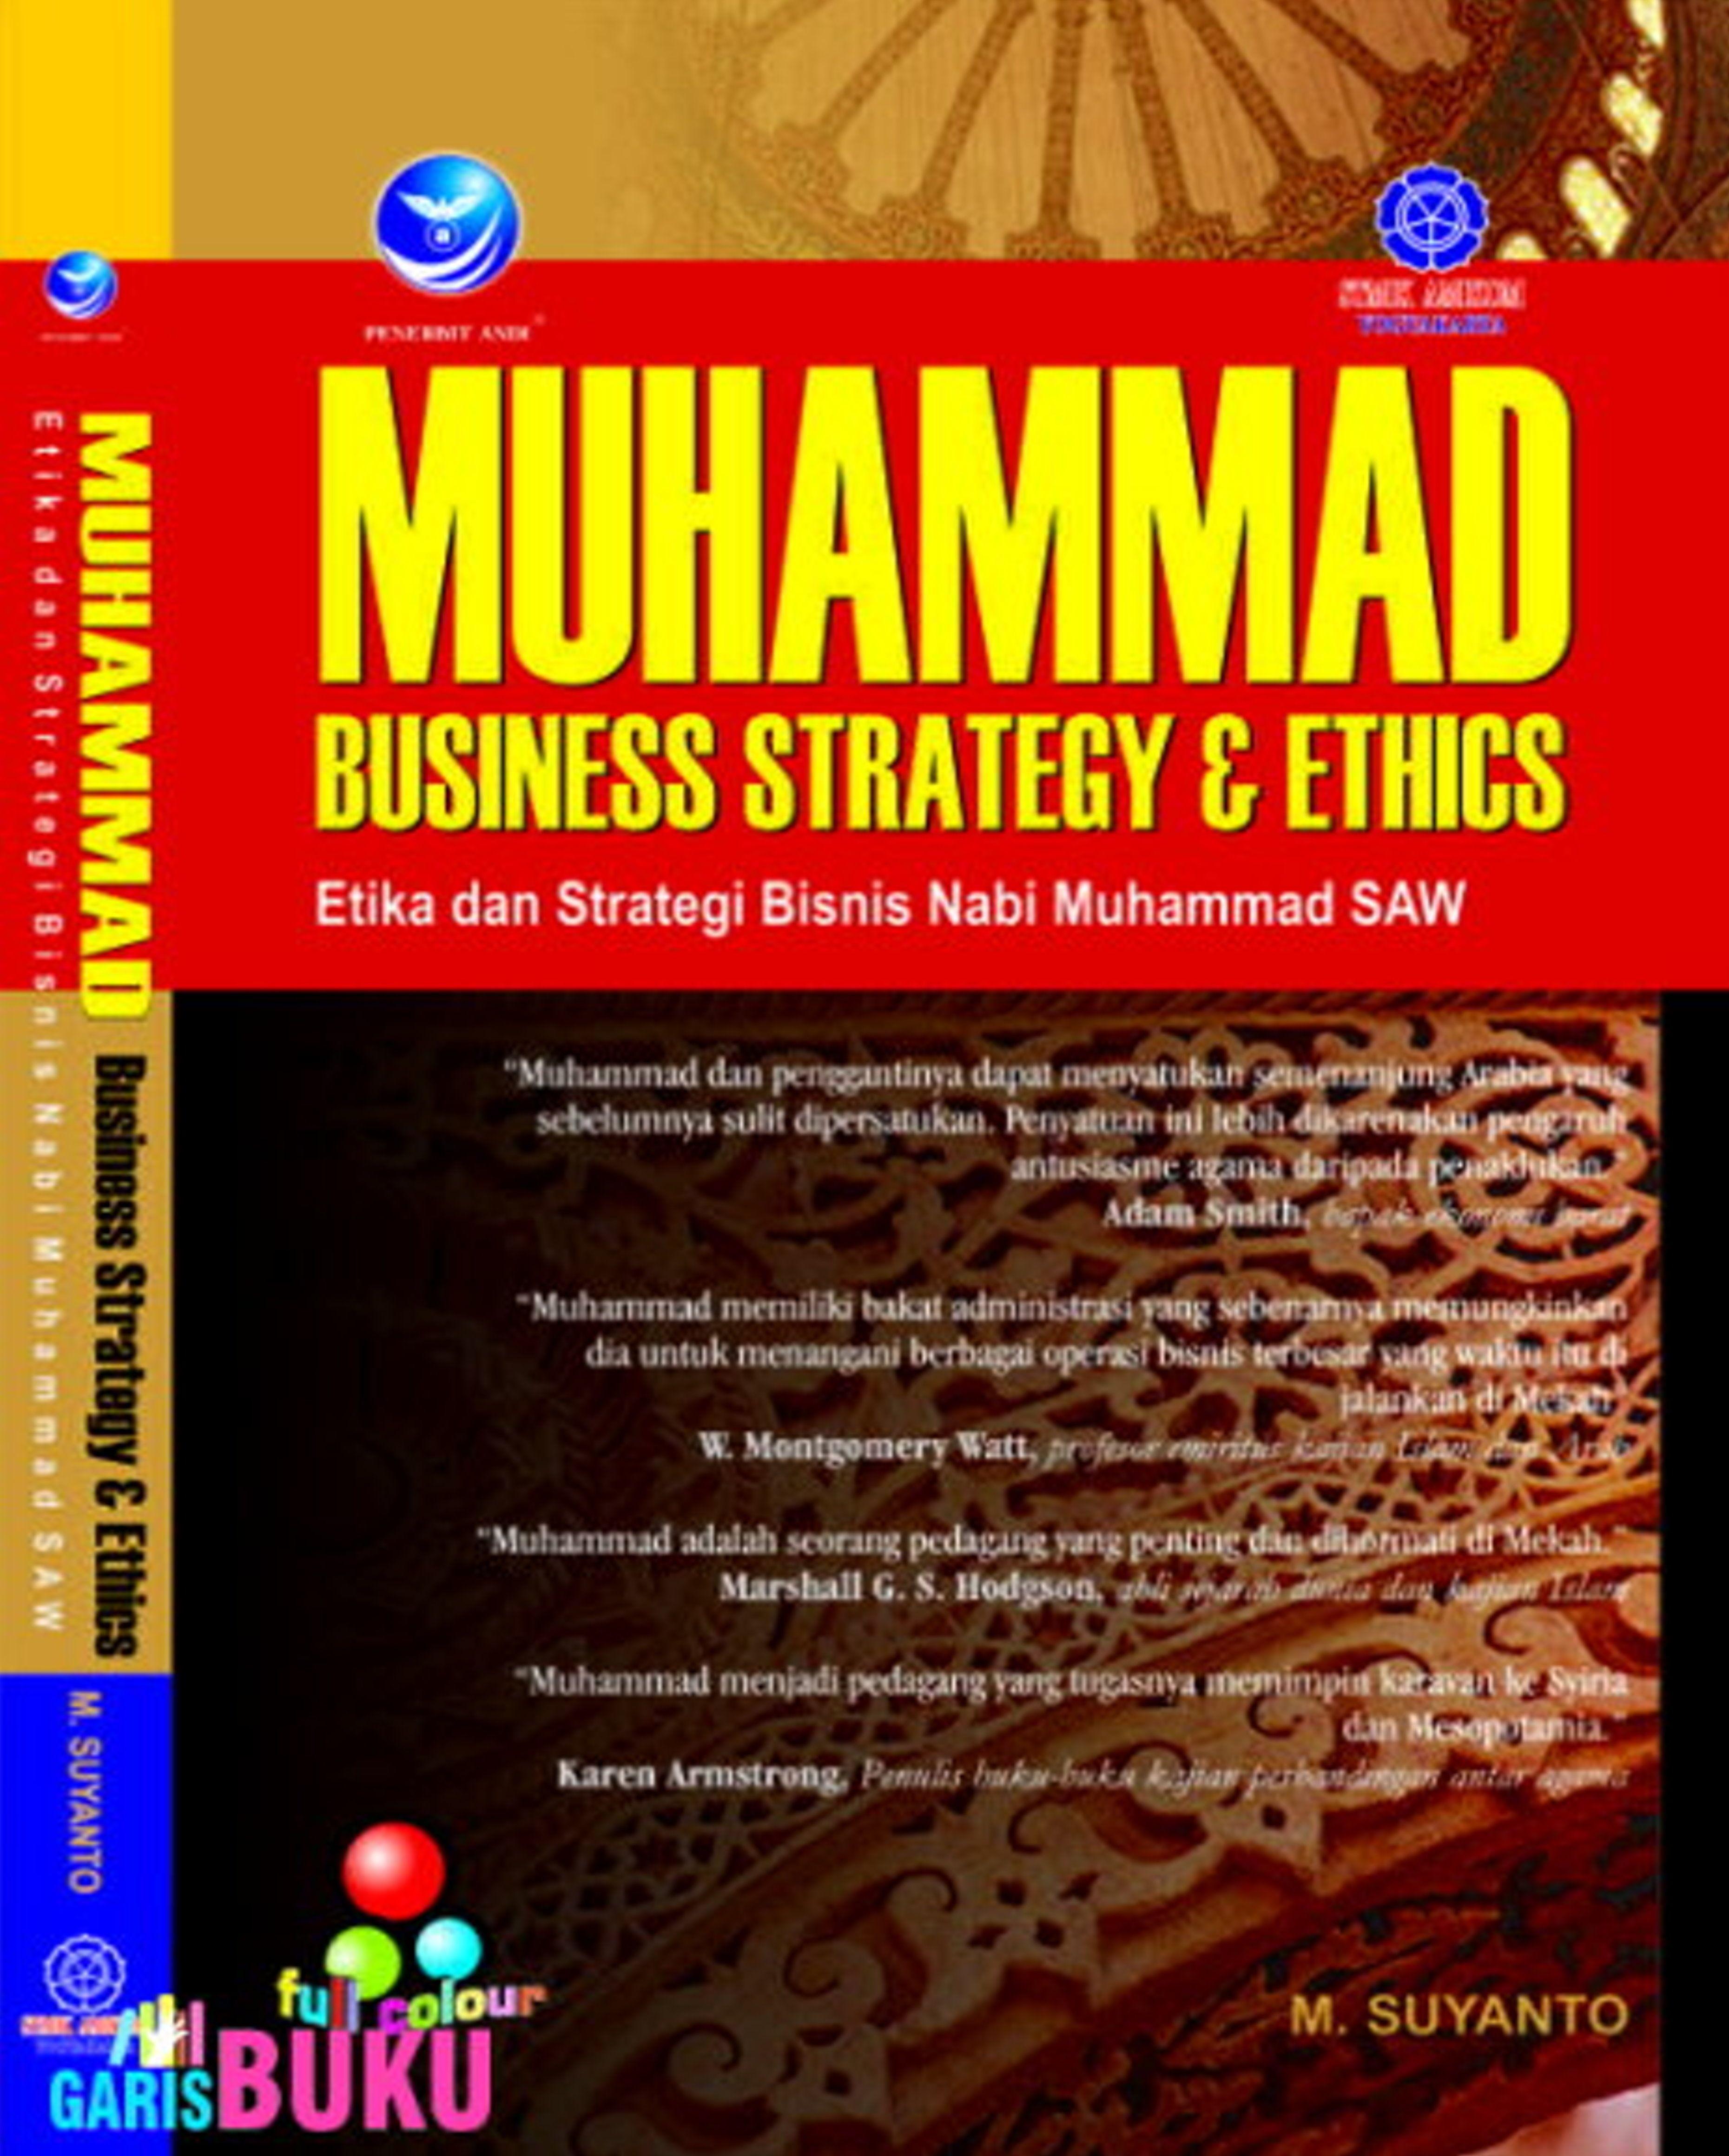 Buku Etika Bisnis Pdf - IlmuSosial.id